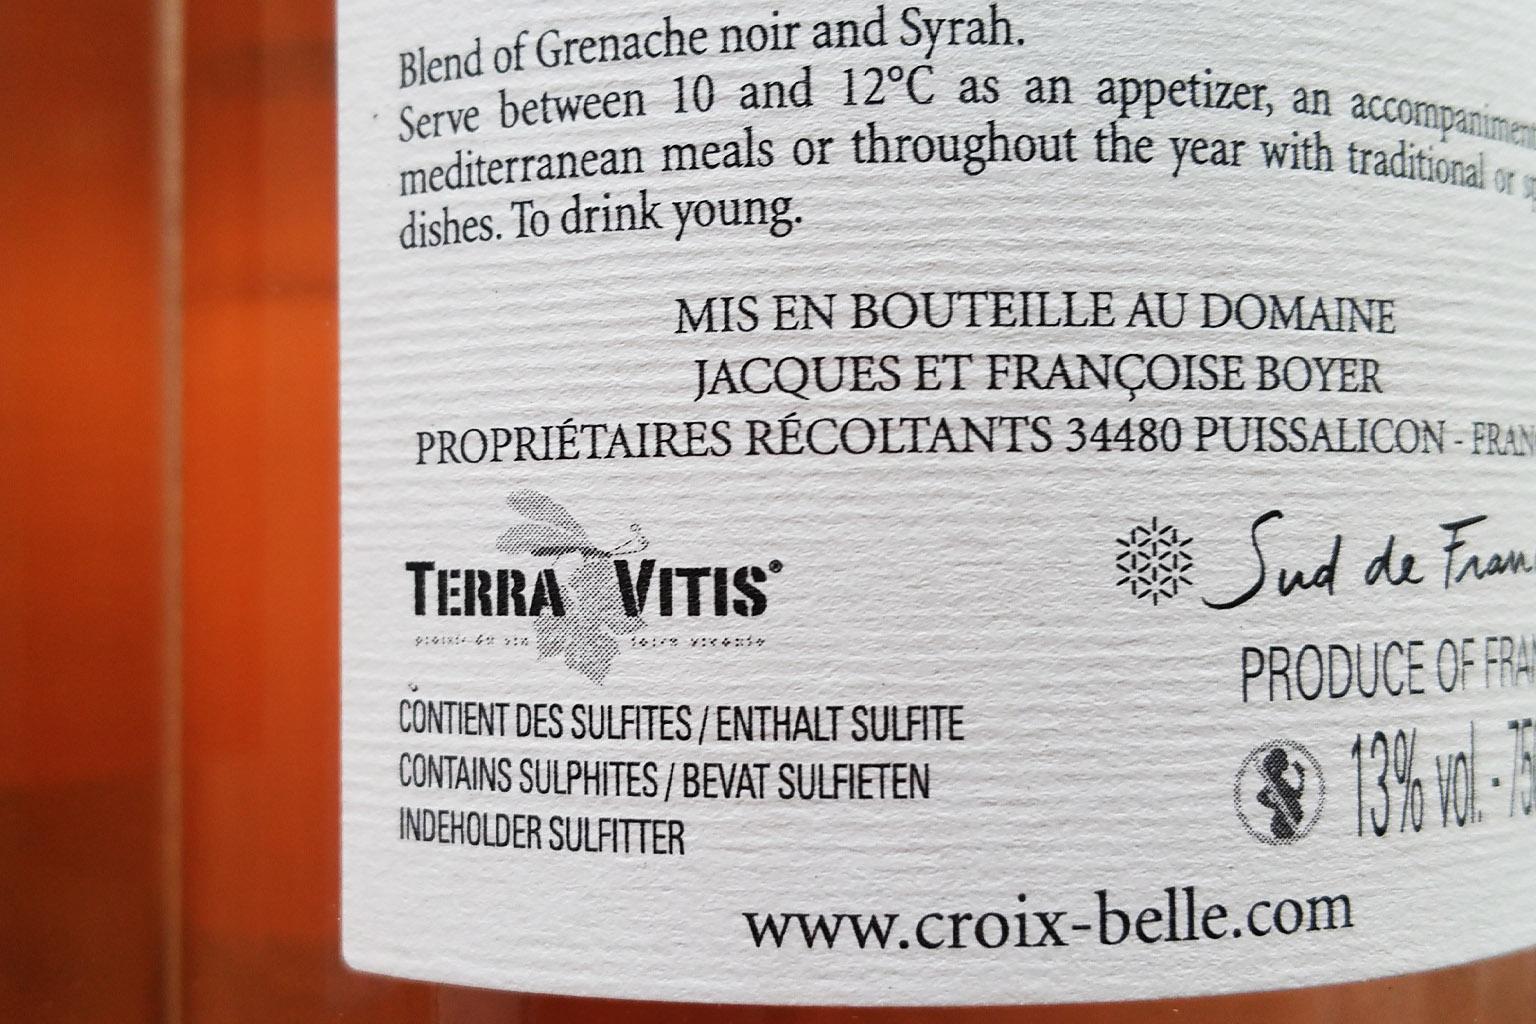 The Terra Vitis Certification - アペロ ワインバー / apéro WINEBAR - vins et petits plats français - Minami Aoyama Tokyo